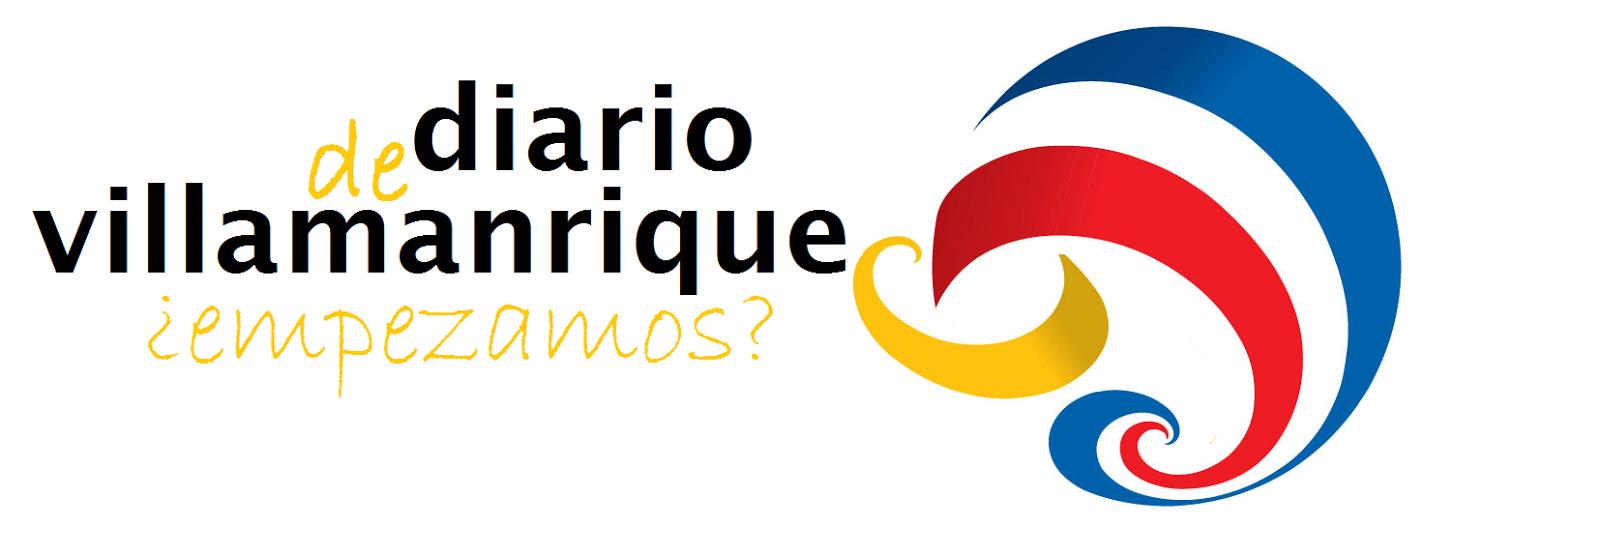 Diario de Villamanrique